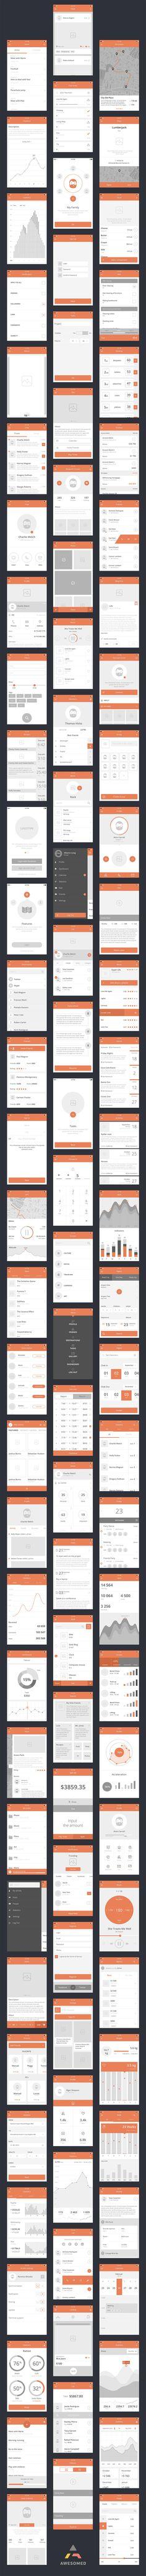 ios-prototyping-ui-kit